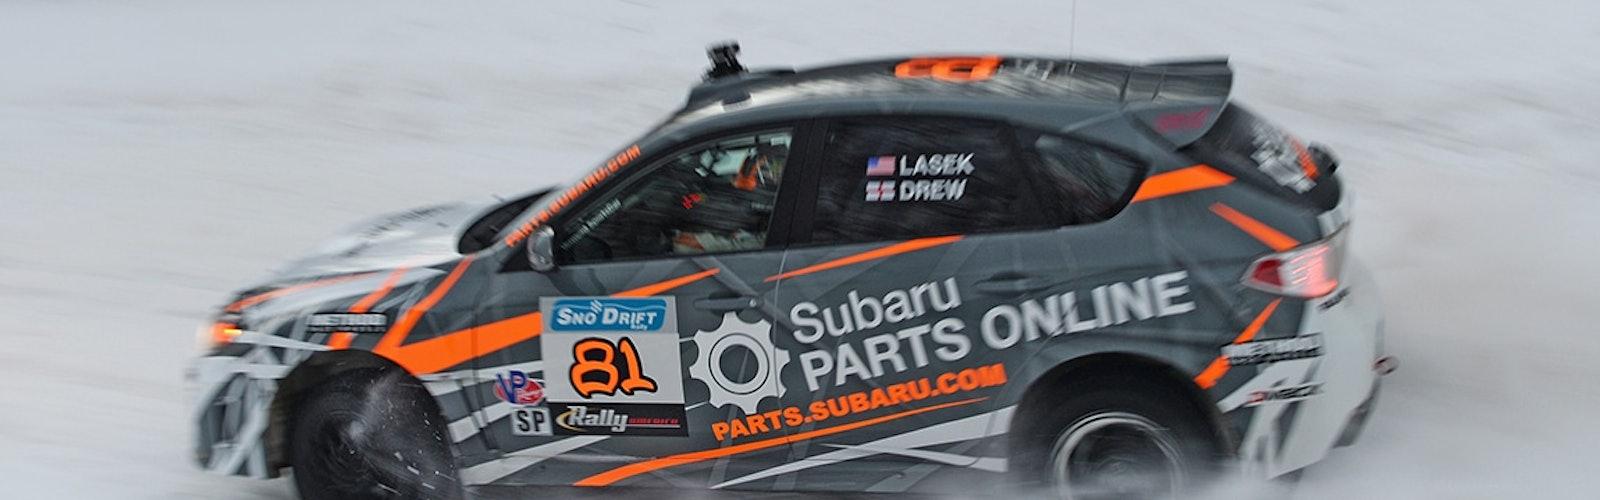 Bucky_Lasek_made_rally_debut_at_SnoDrift_Rally_Jan2016